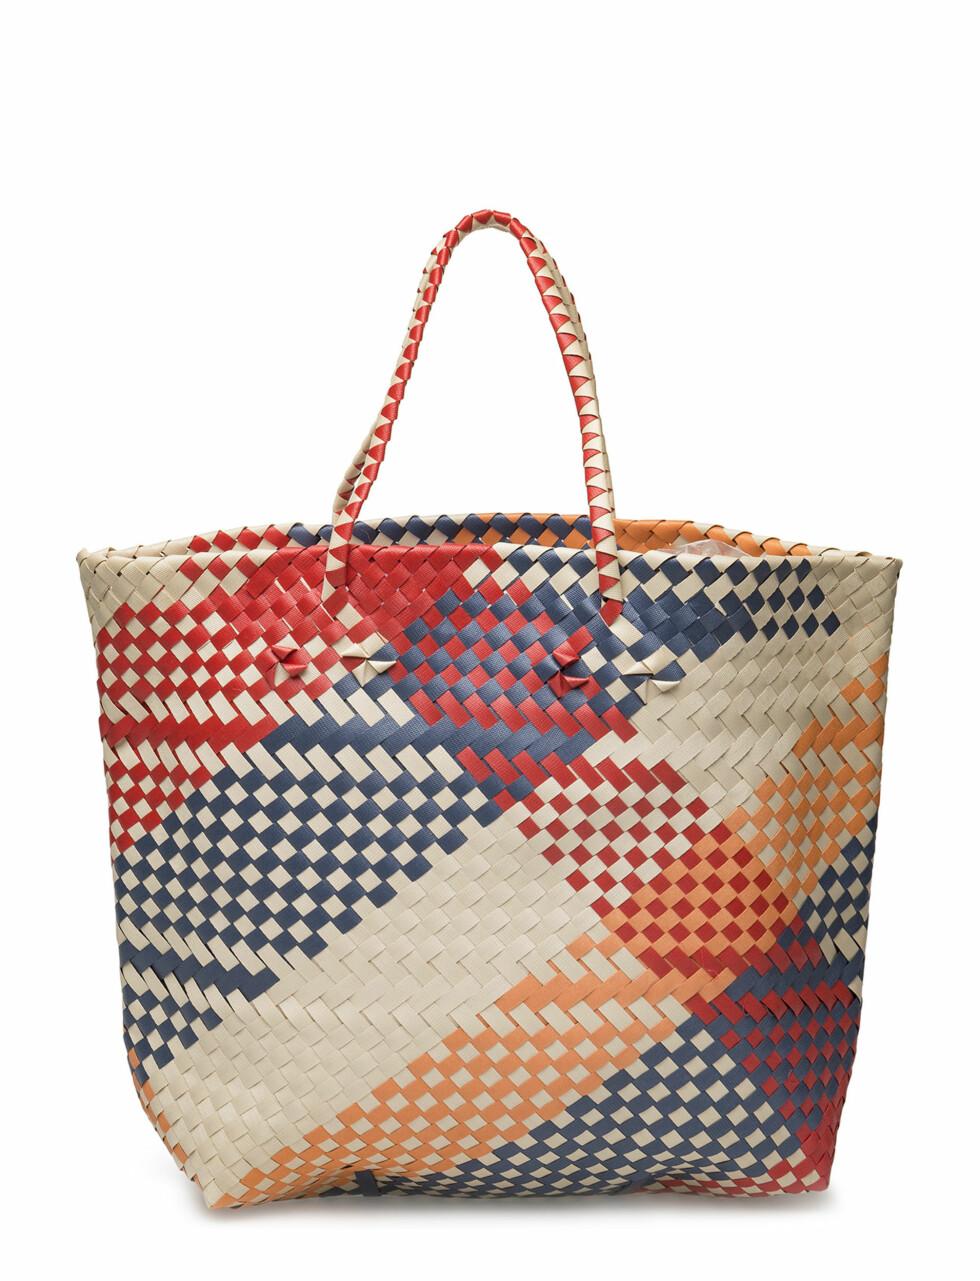 Veske fra Mango 269,-| https://www.boozt.com/no/no/mango/braided-shopper-bag_18178133/18178136?navId=67362&sNavId=67535&group=listing&position=1000000